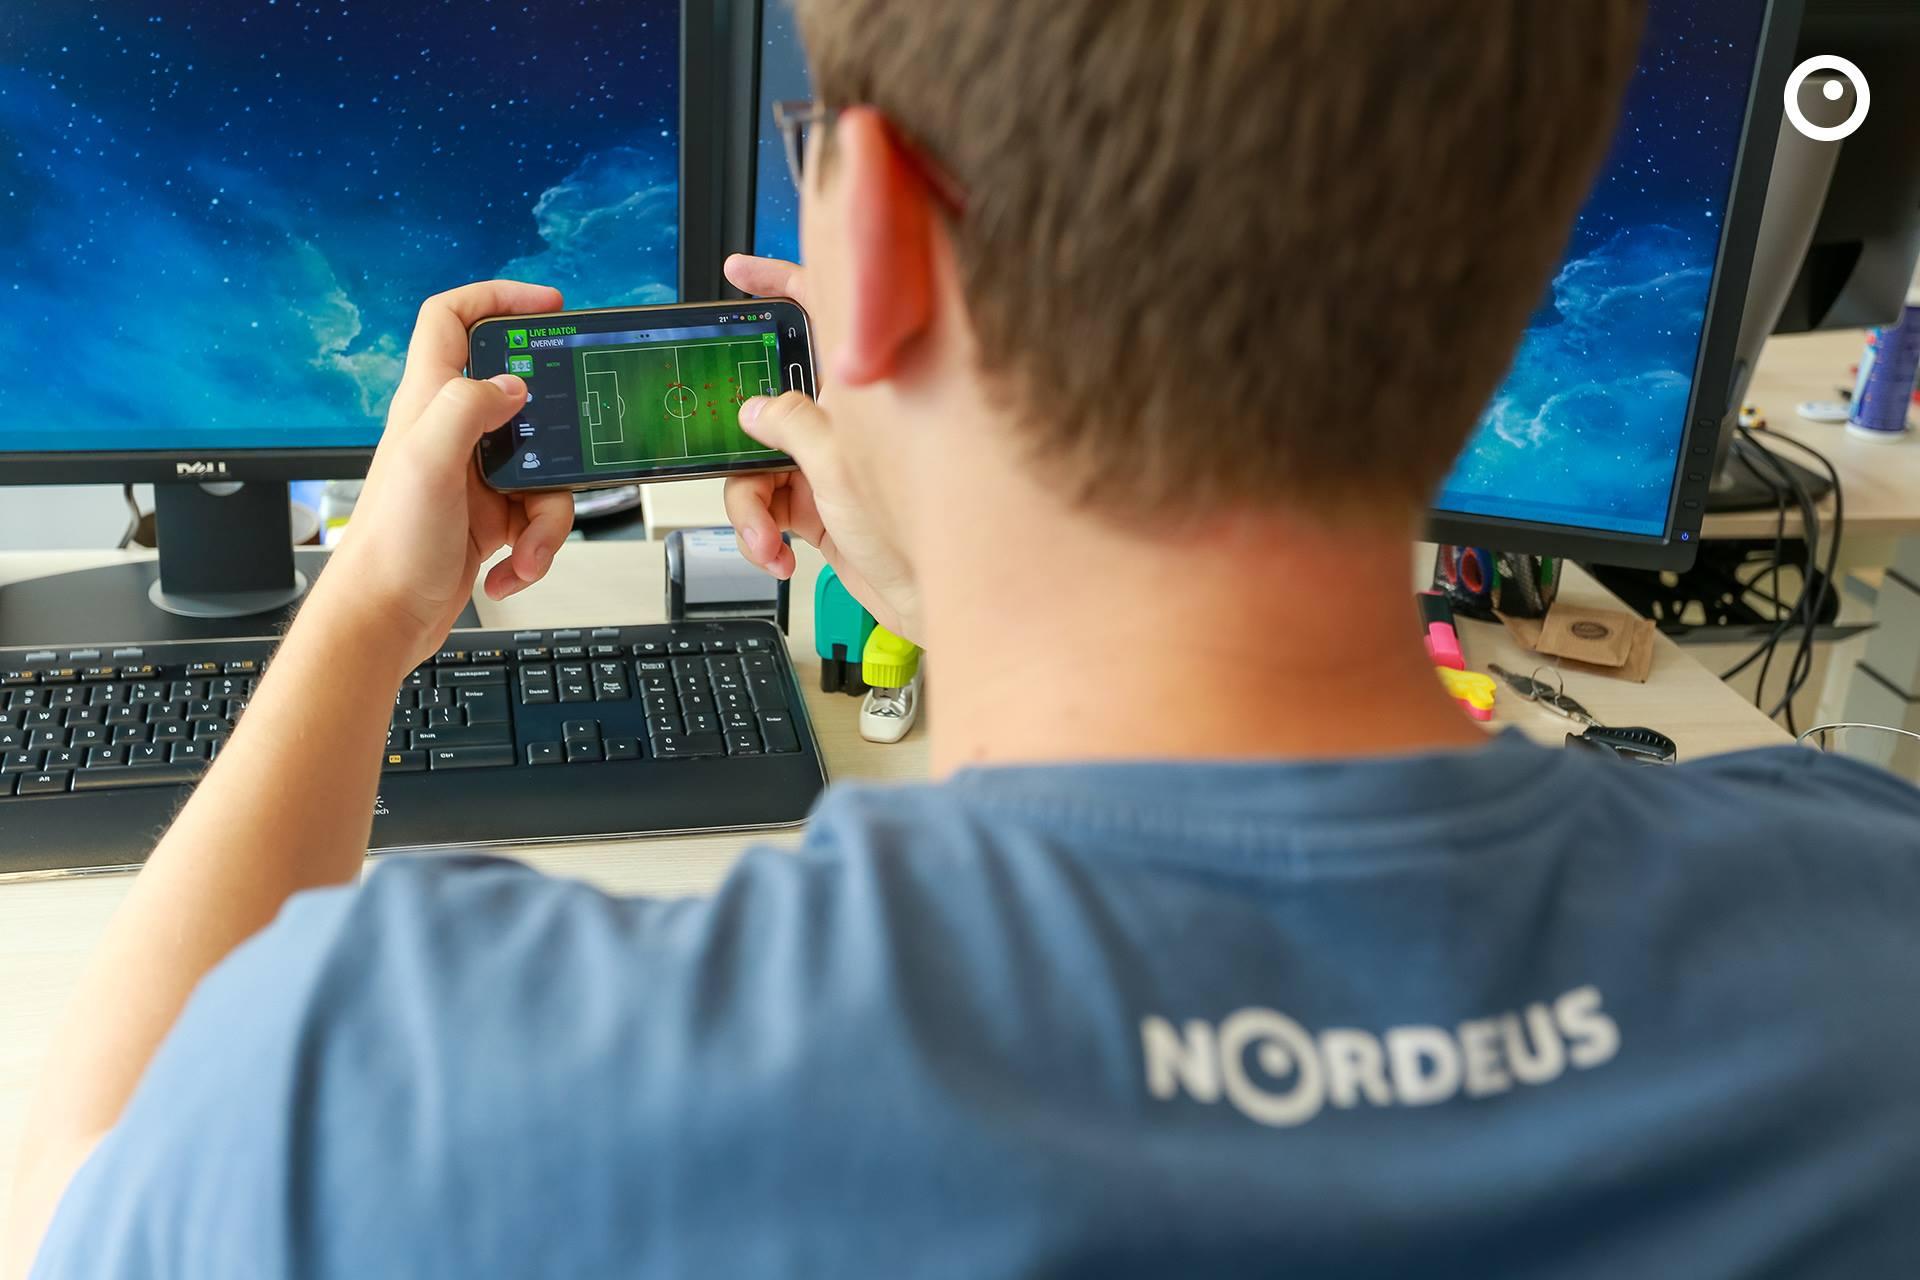 Nordeus d.o.o. / Kazoze, ocijeni poslodavca...